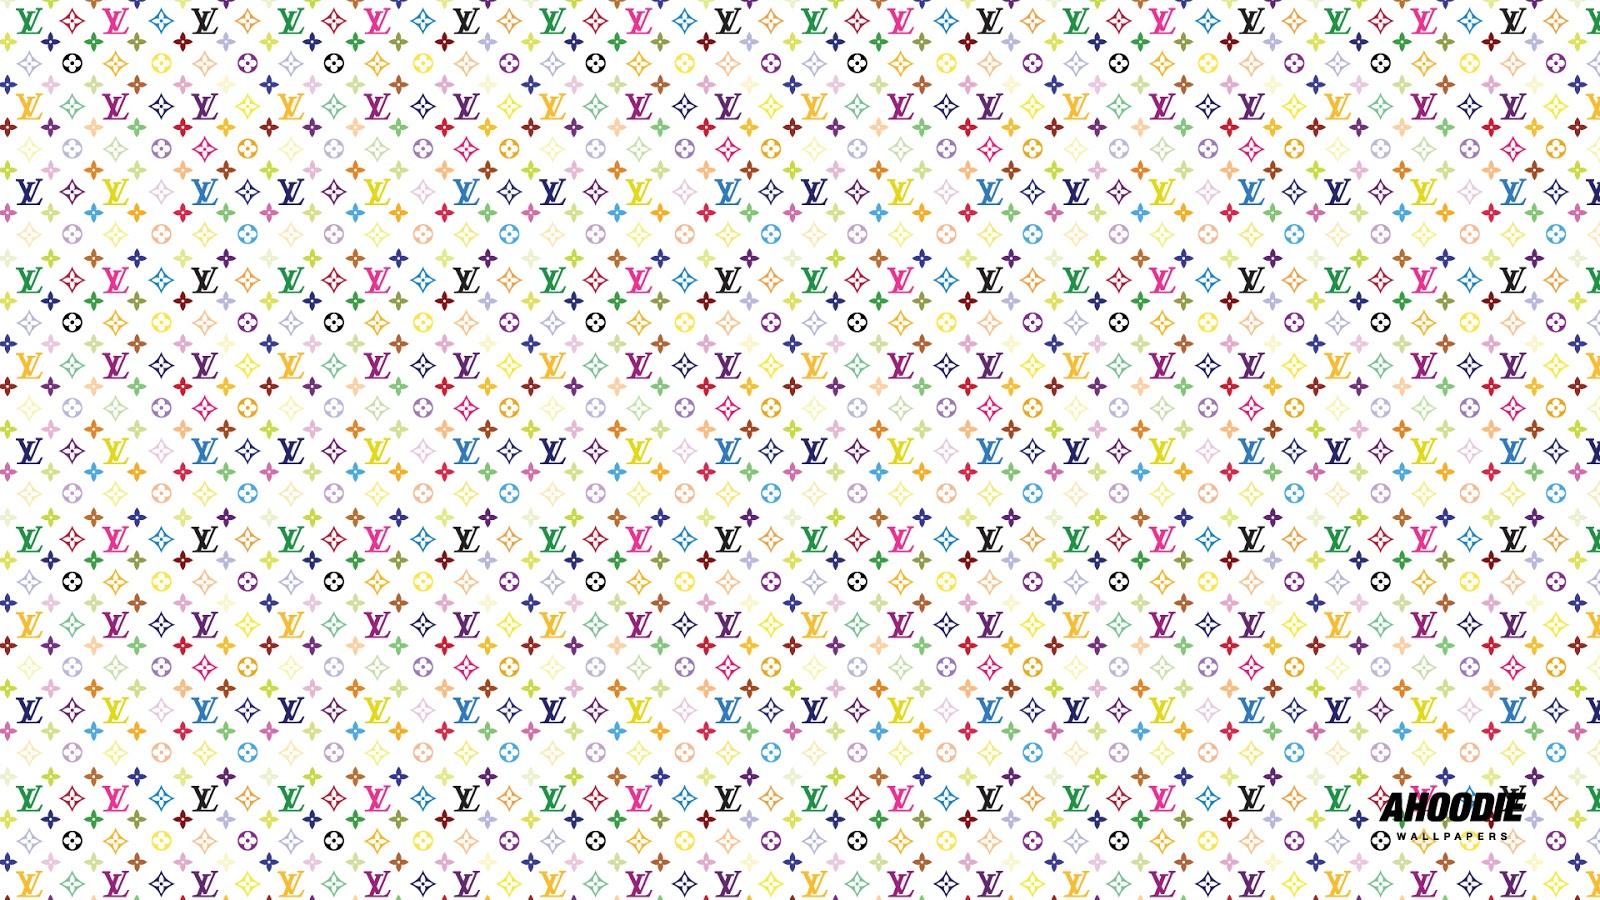 Louis Vuitton Full Hd Desktop Wallpapers Wallpapers Full Hd